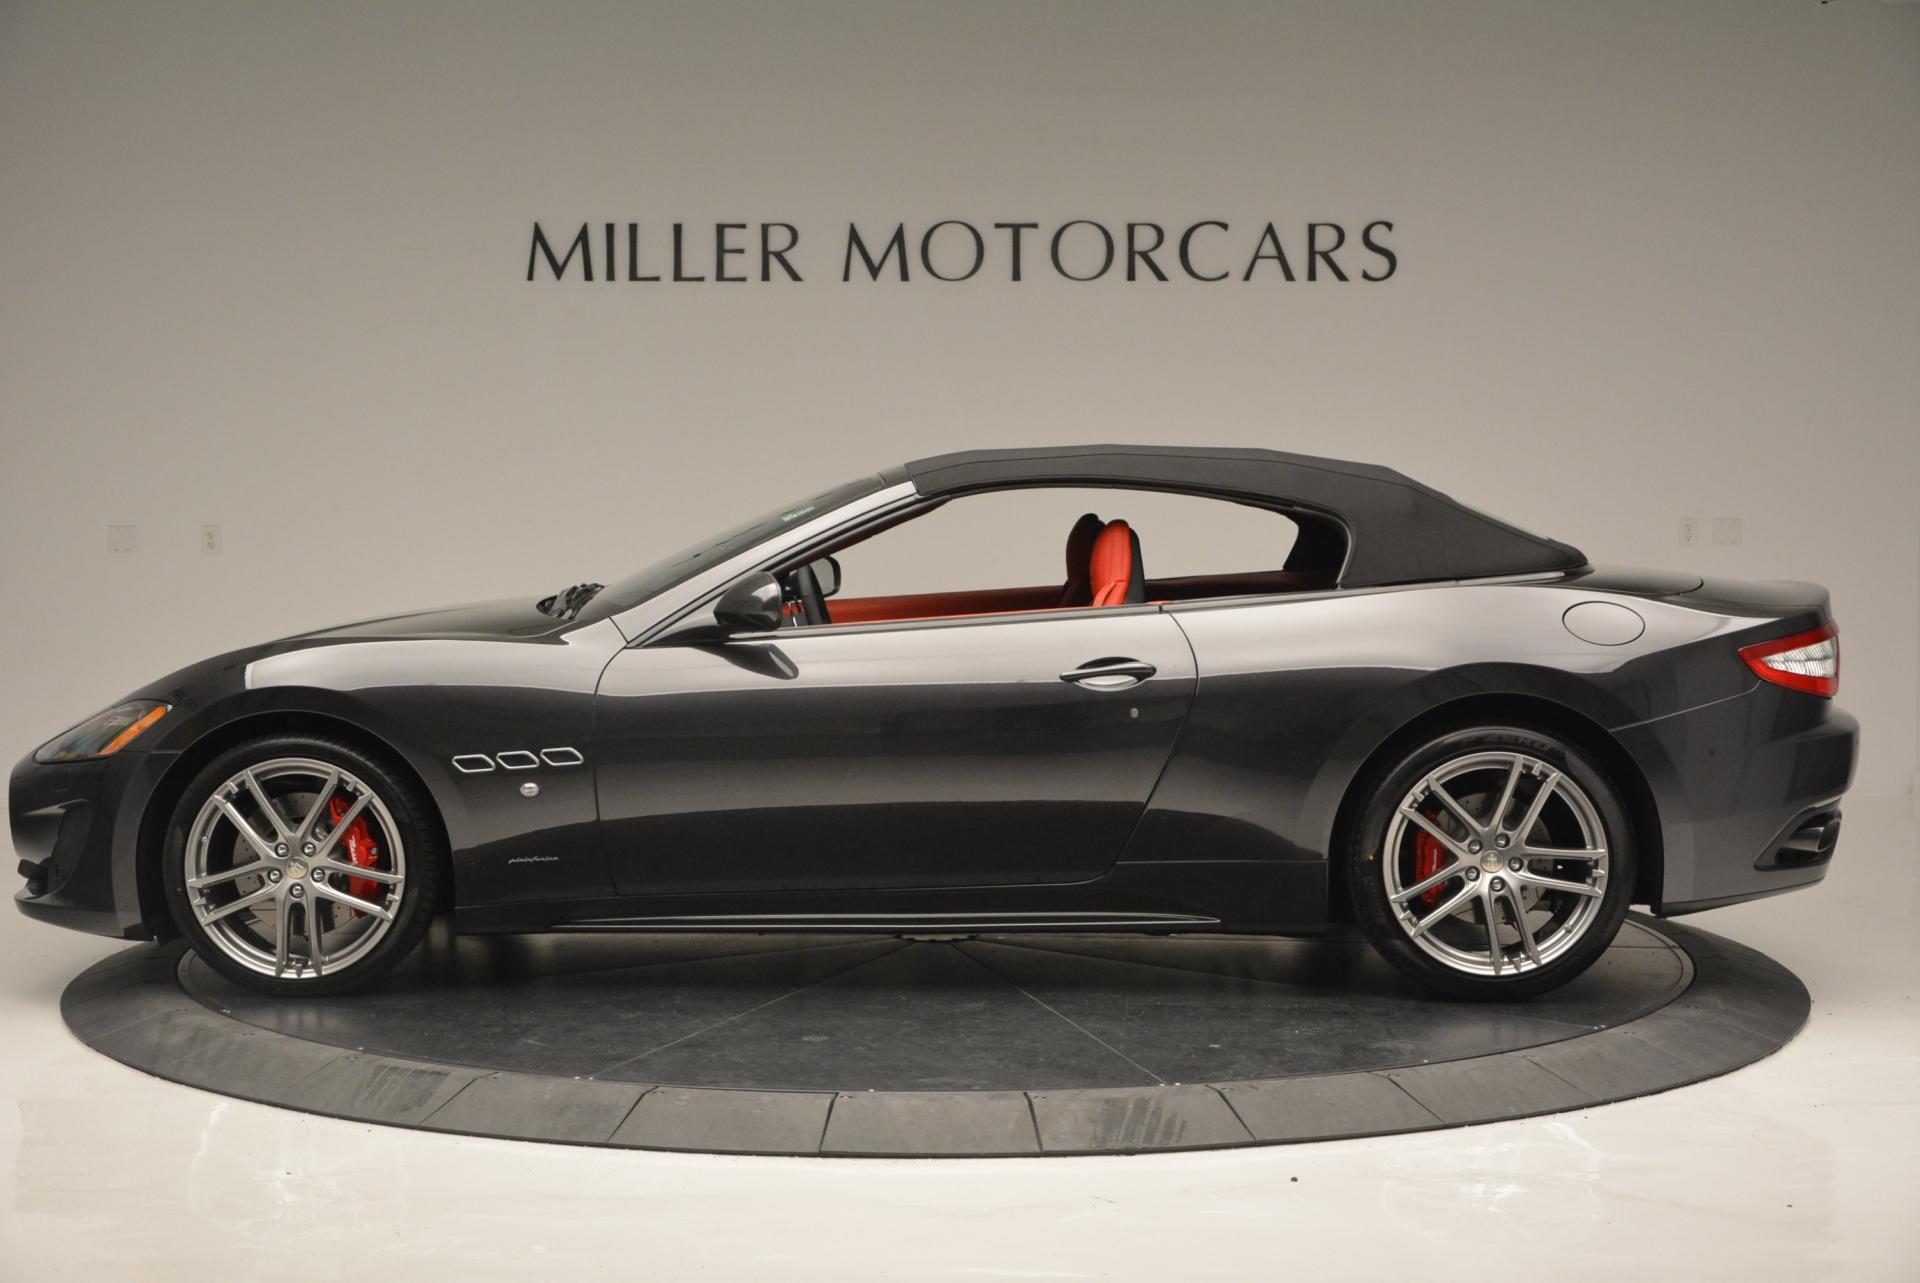 New 2017 Maserati GranTurismo Convertible Sport For Sale In Westport, CT 156_p6